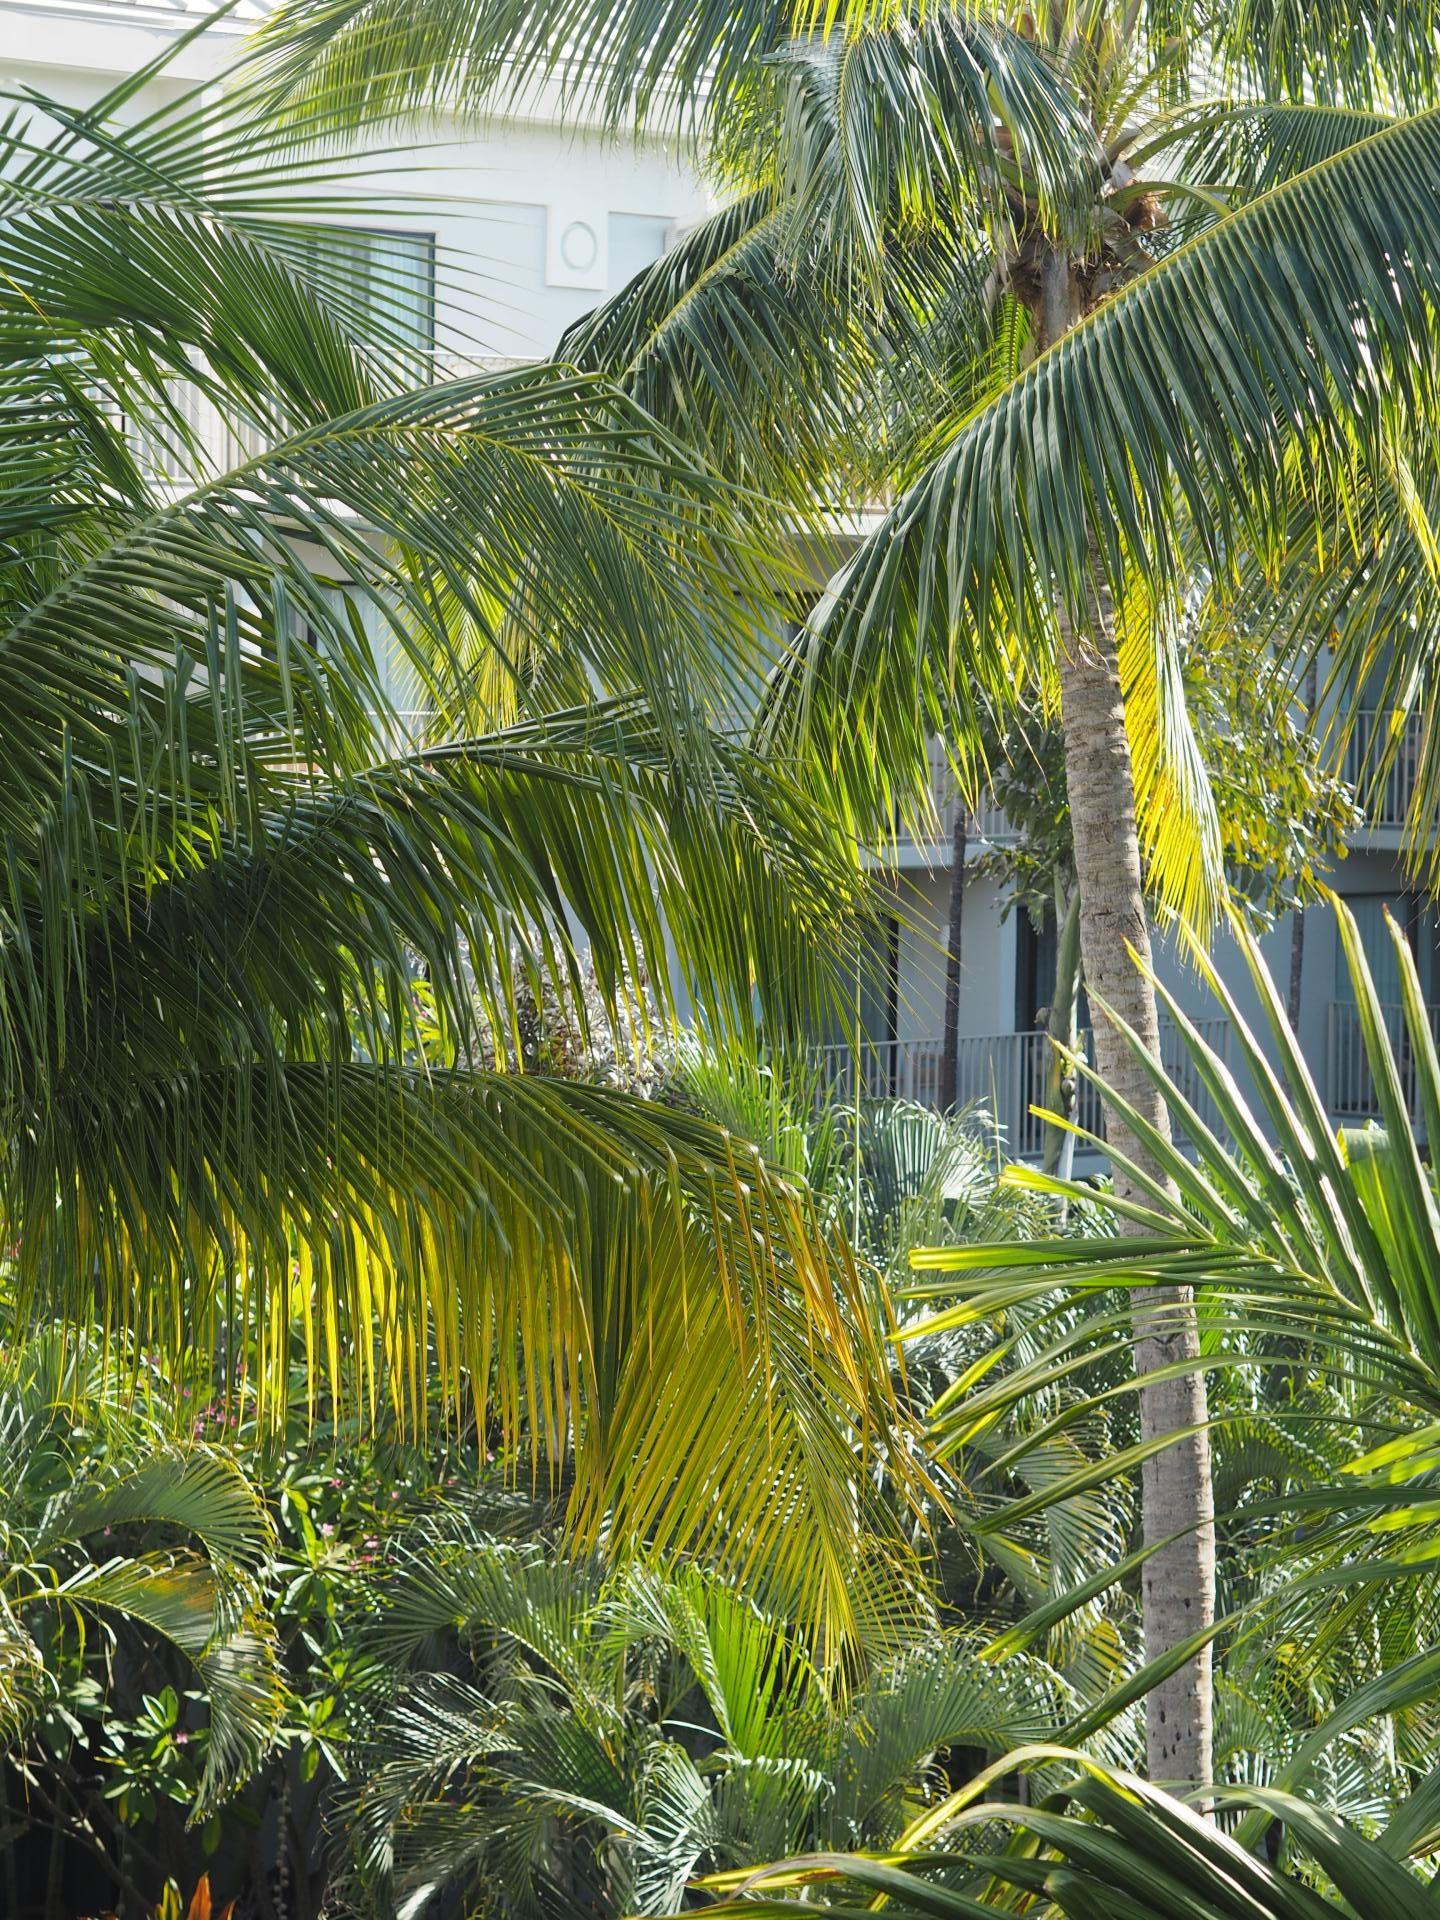 Cayman Islands - Trees Cayman Brac - Le Soleil d'Or